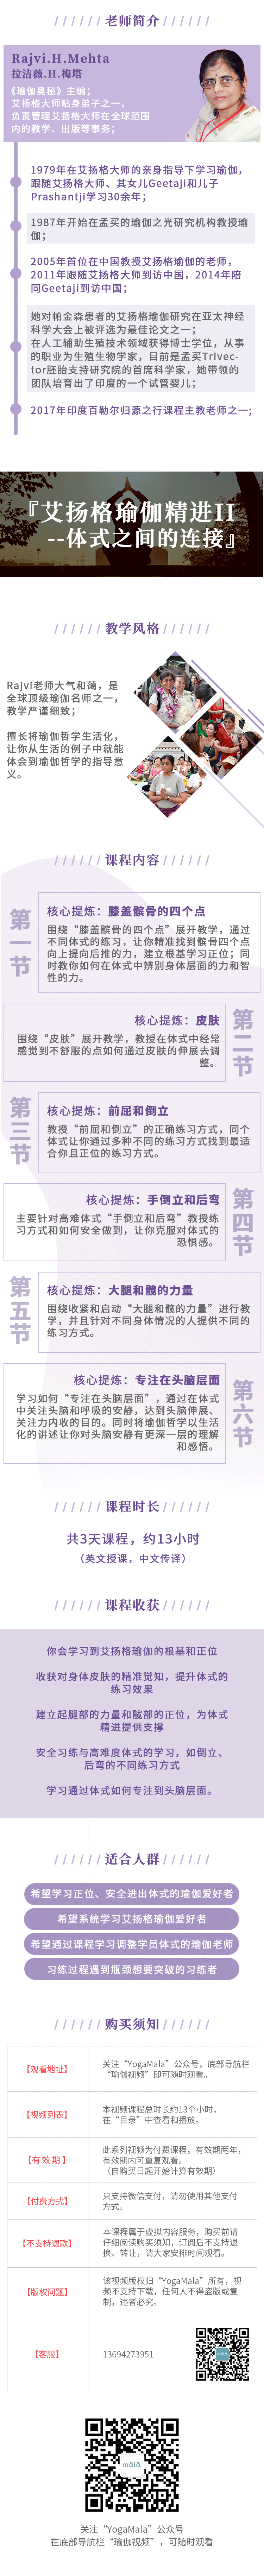 H5-精炼2详情页-拷贝.png